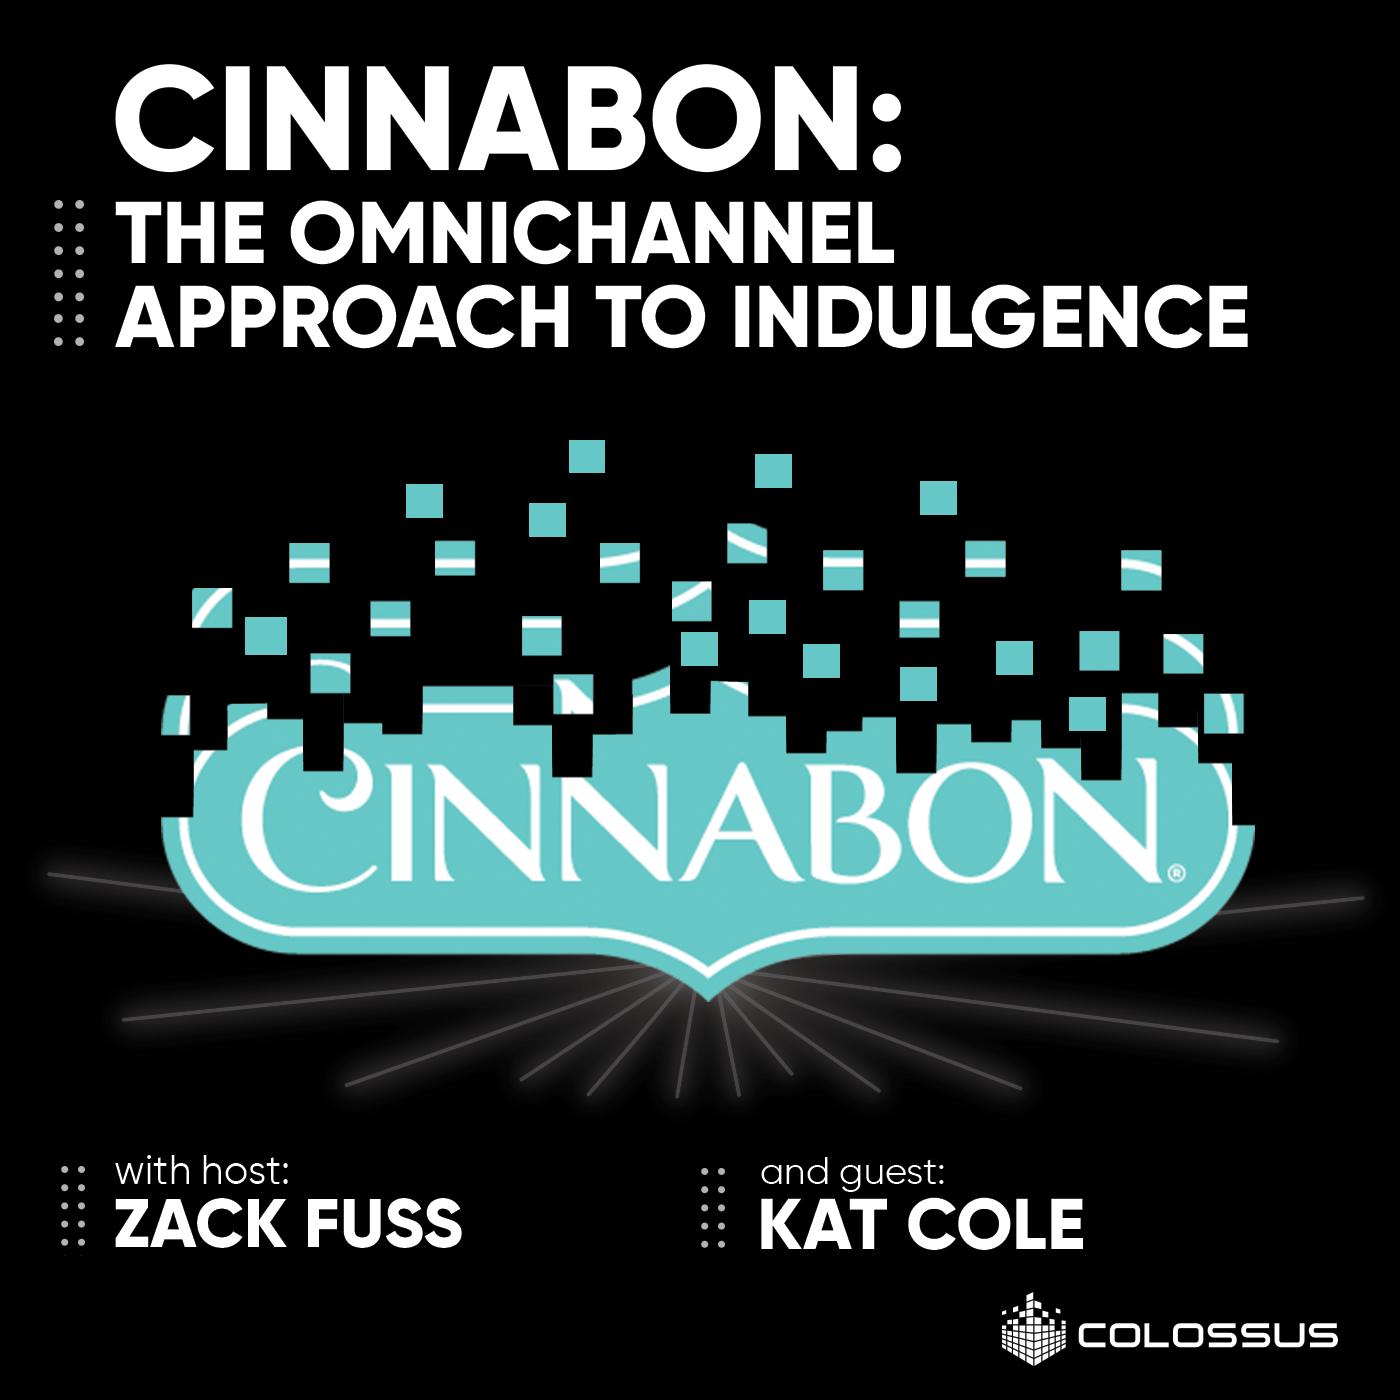 Cinnabon: The Omnichannel Approach to Indulgence